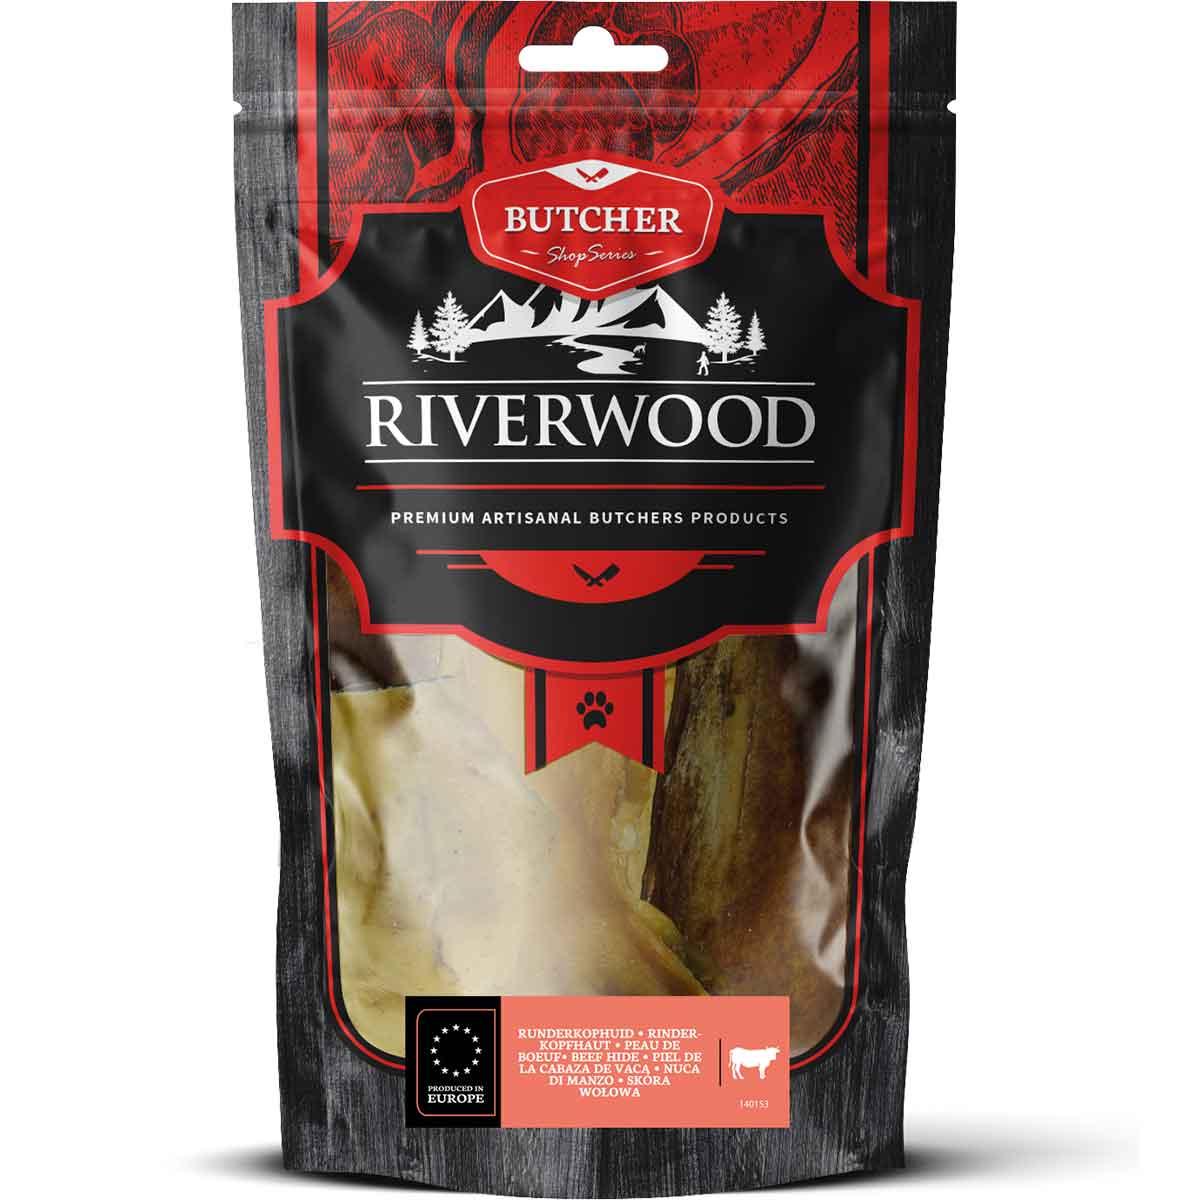 Riverwood Runderkophuid